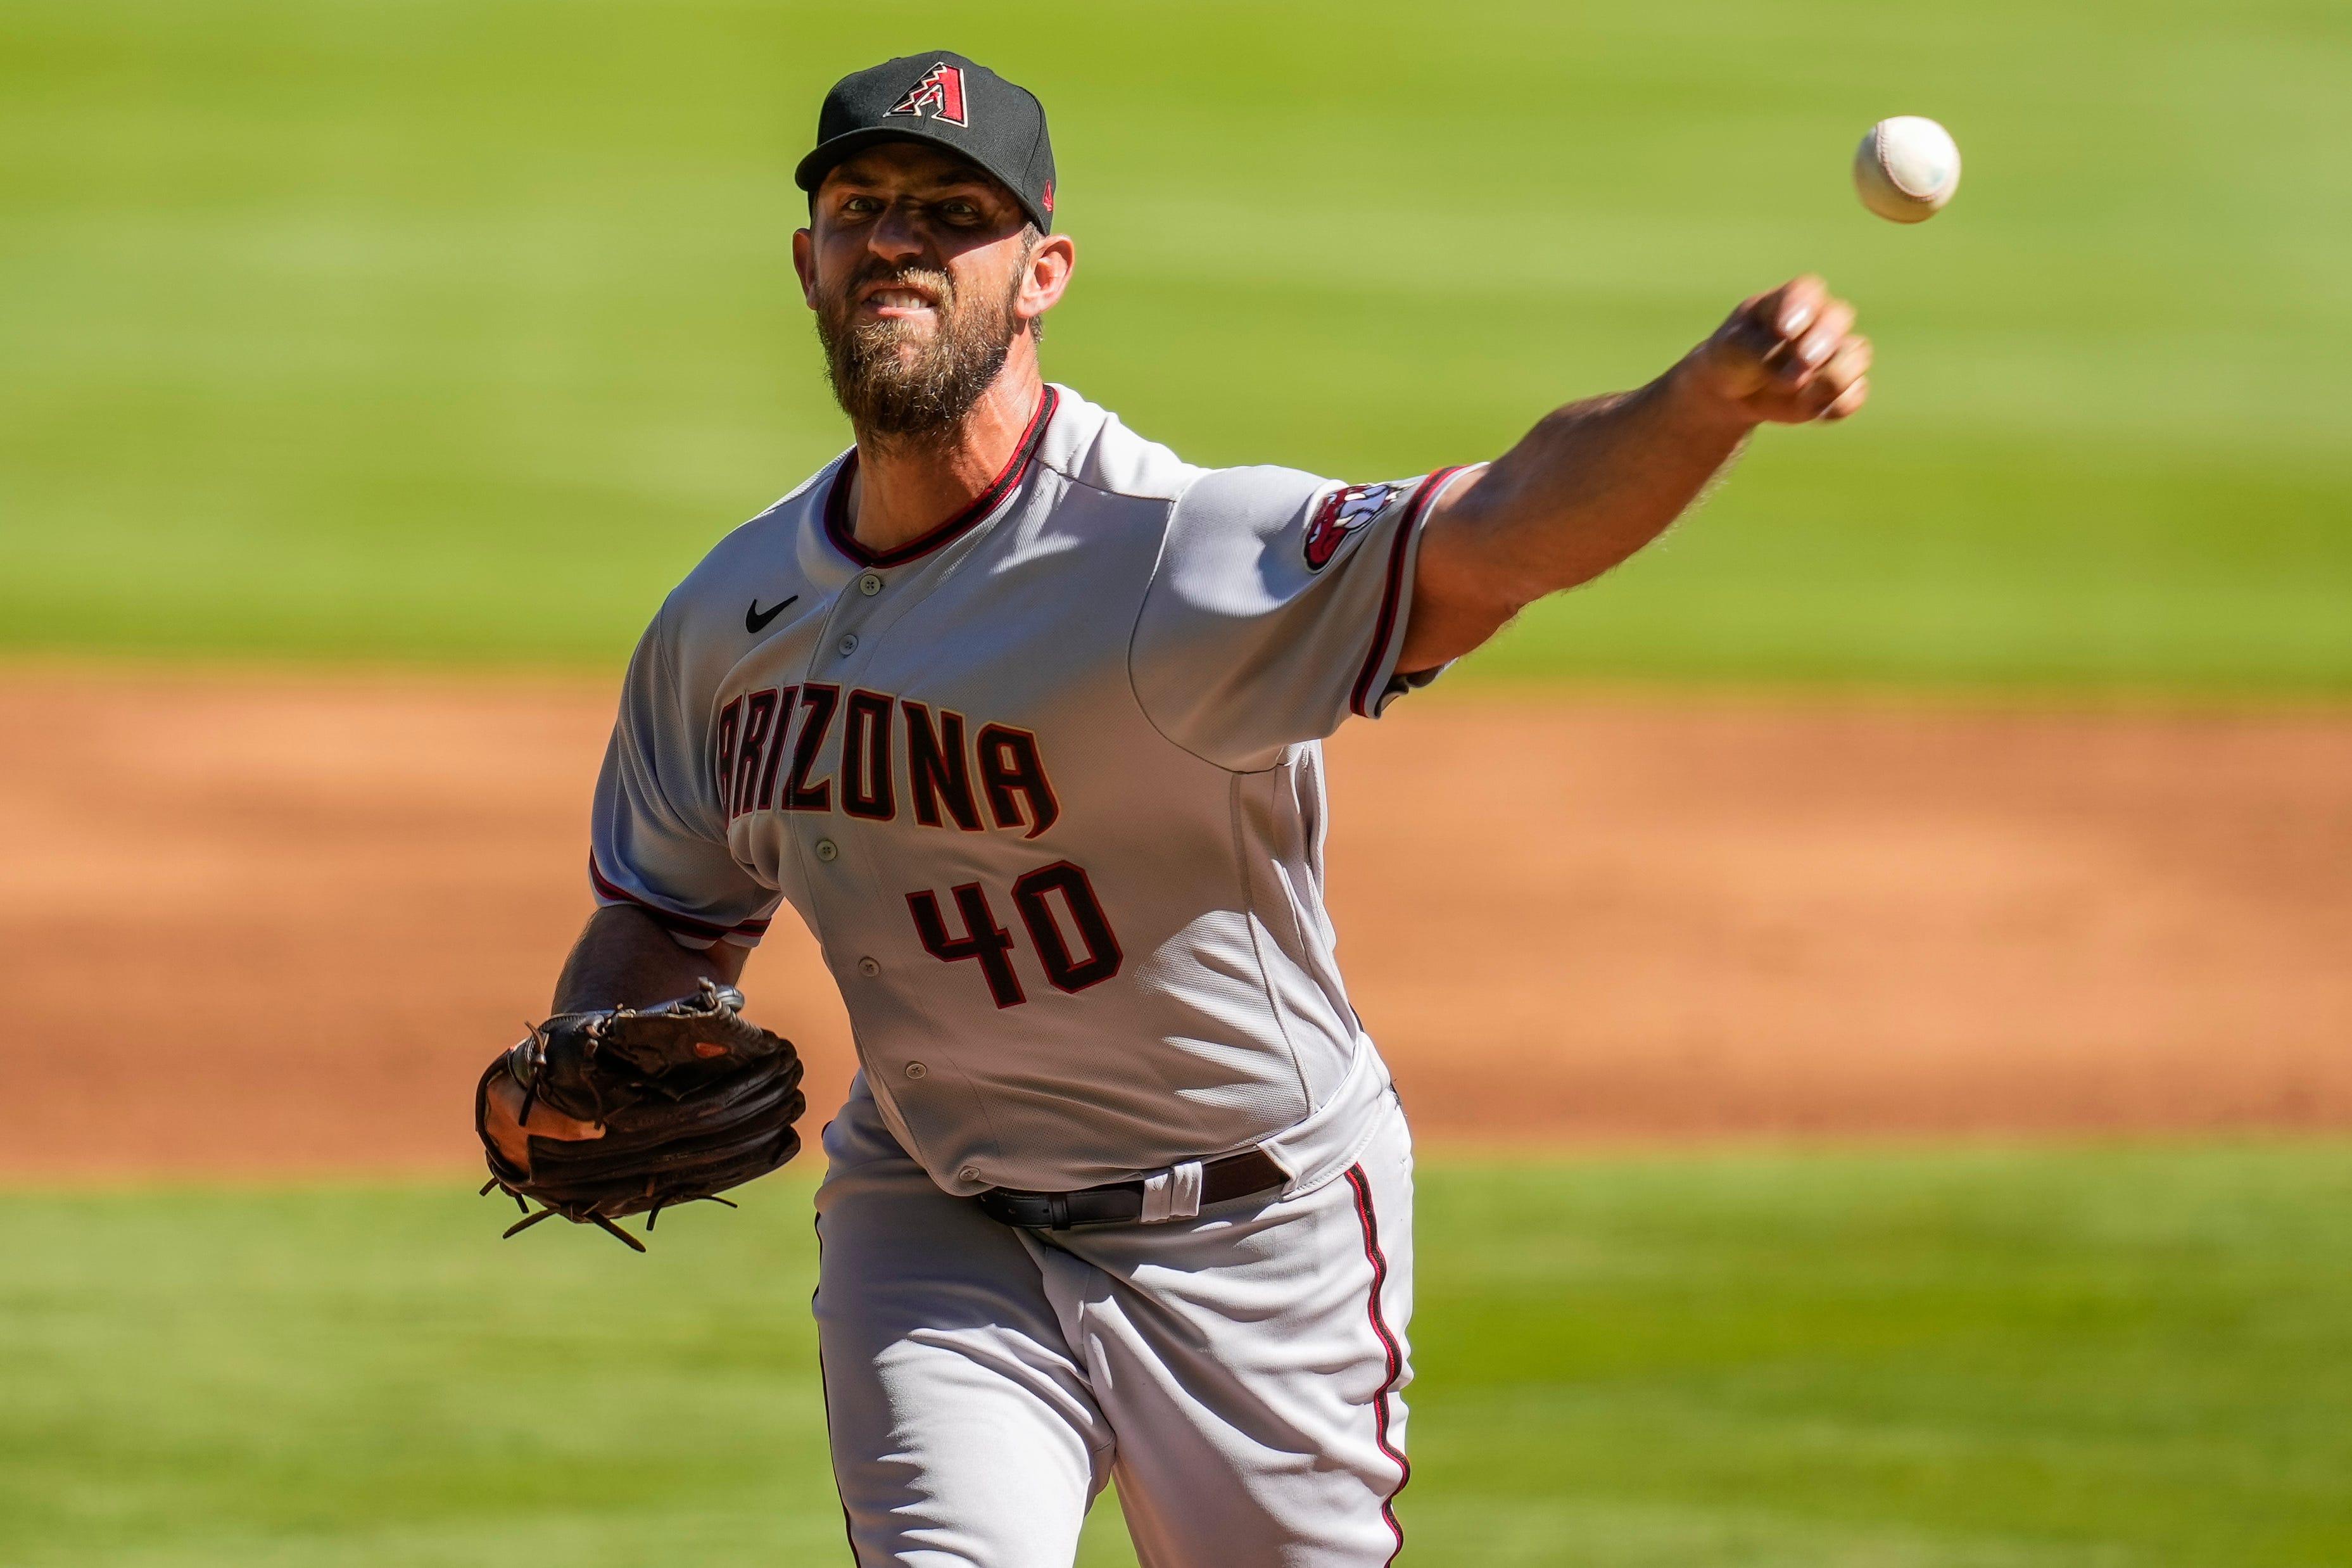 Madison Bumgarner throws unofficial 7-inning no-hitter vs. Braves